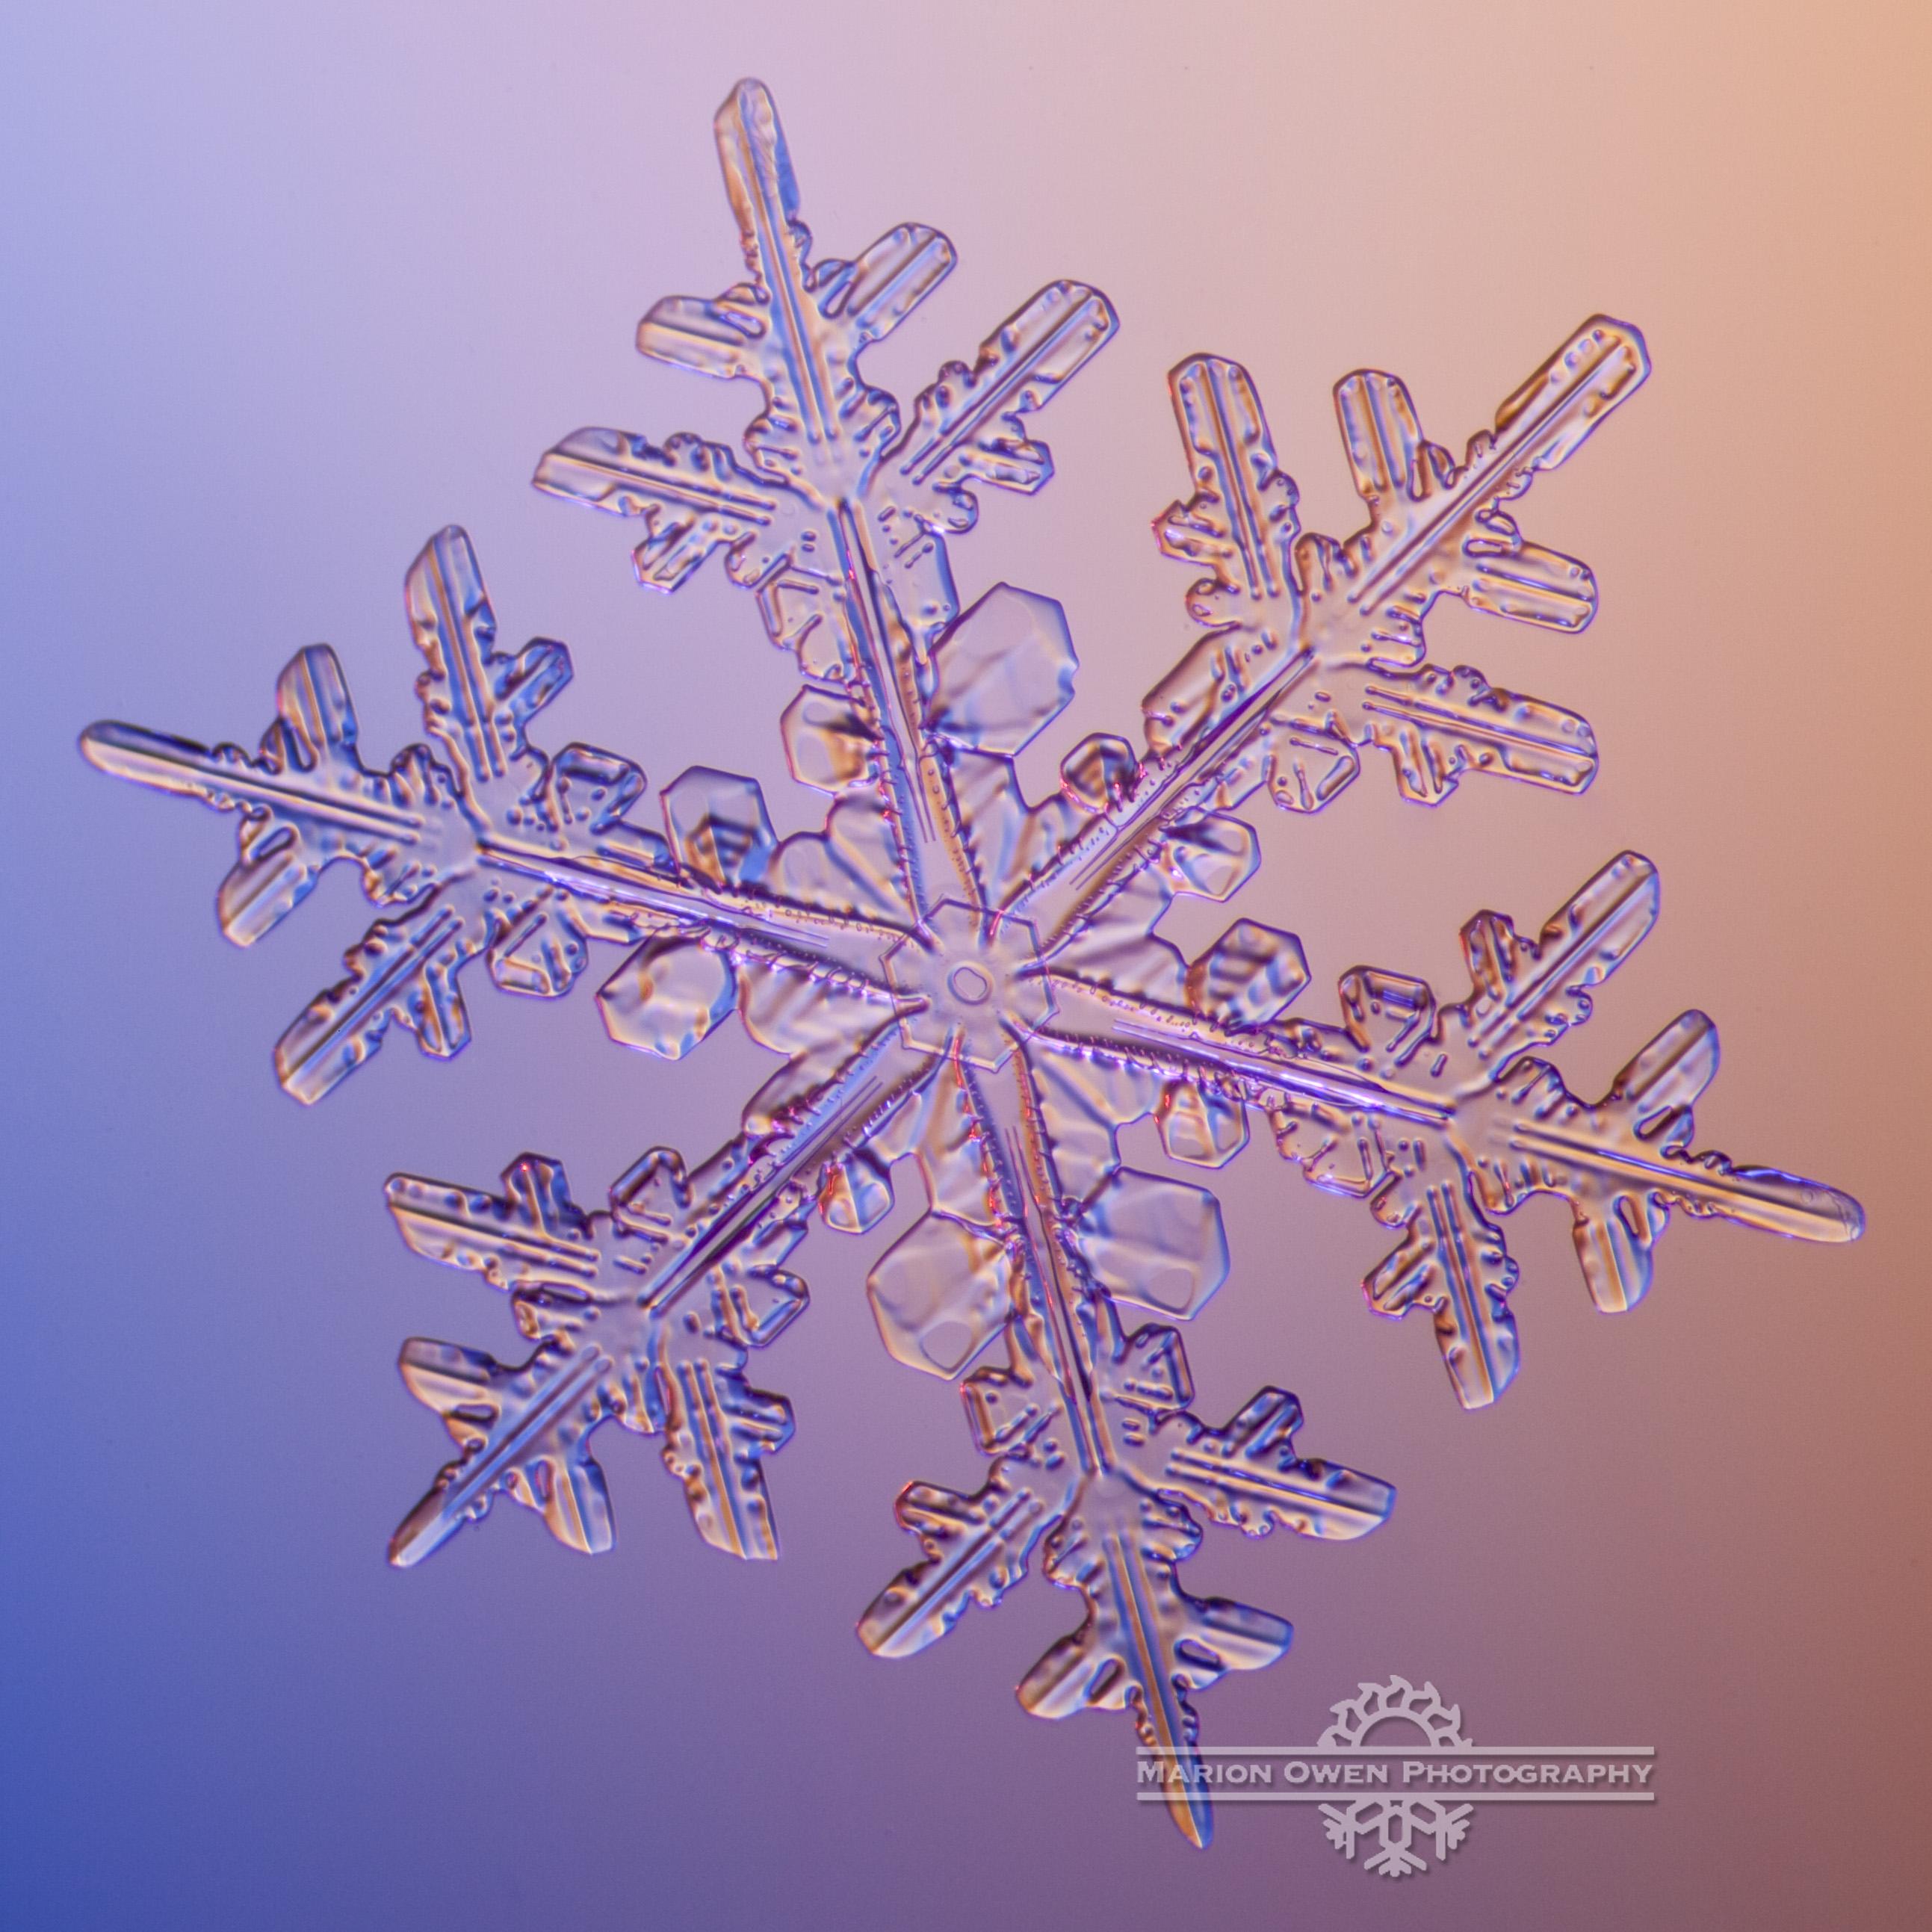 Snowflake, snow crystal, winter, ice, Alaska, Kodiak, photograph, macro, microscope